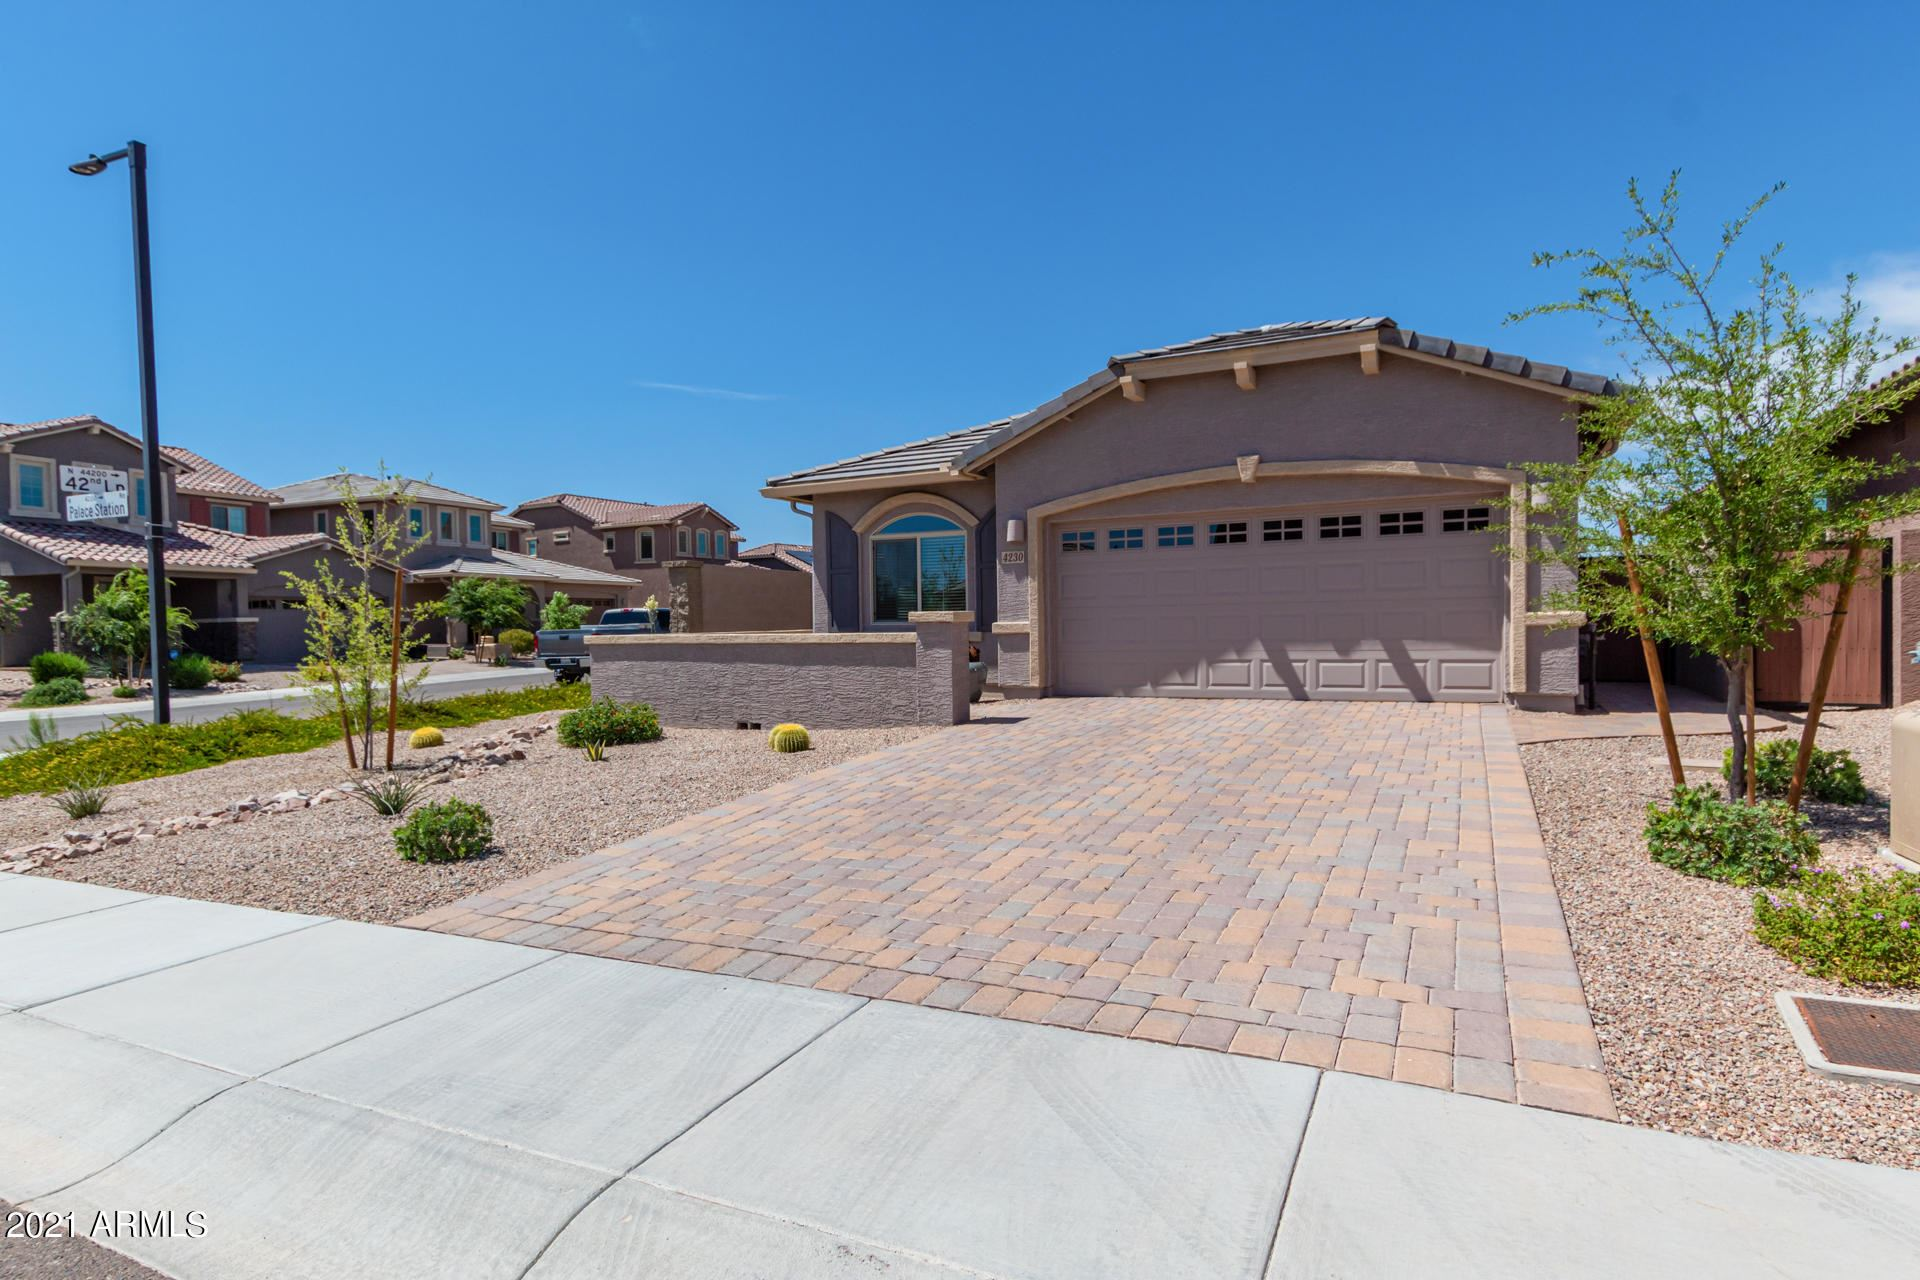 Photo of 4230 W PALACE STATION Road, New River, AZ 85087 (MLS # 6240794)